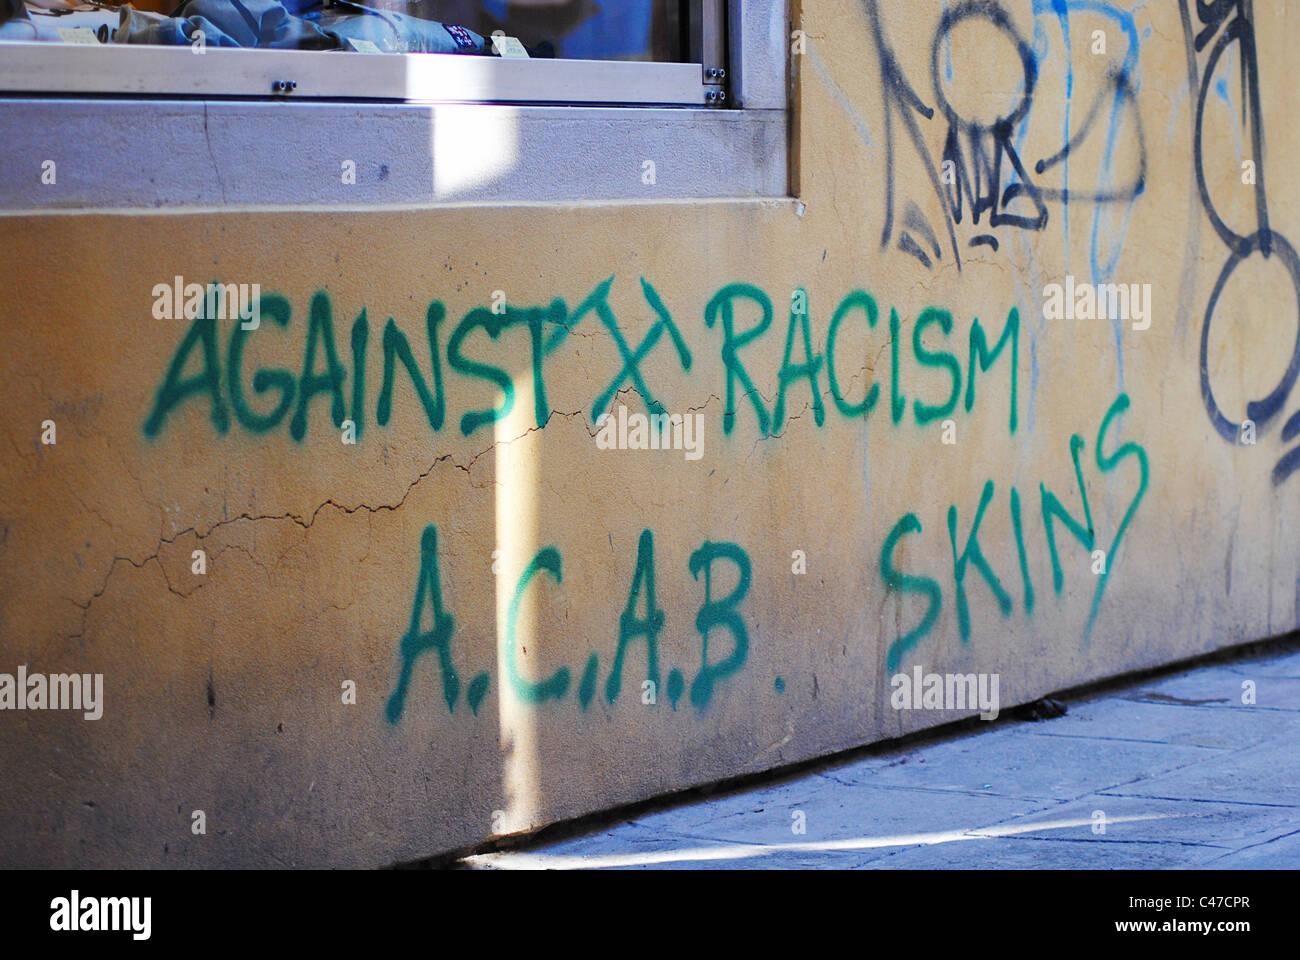 Anti-racist graffiti in Venice, Italy Stock Photo